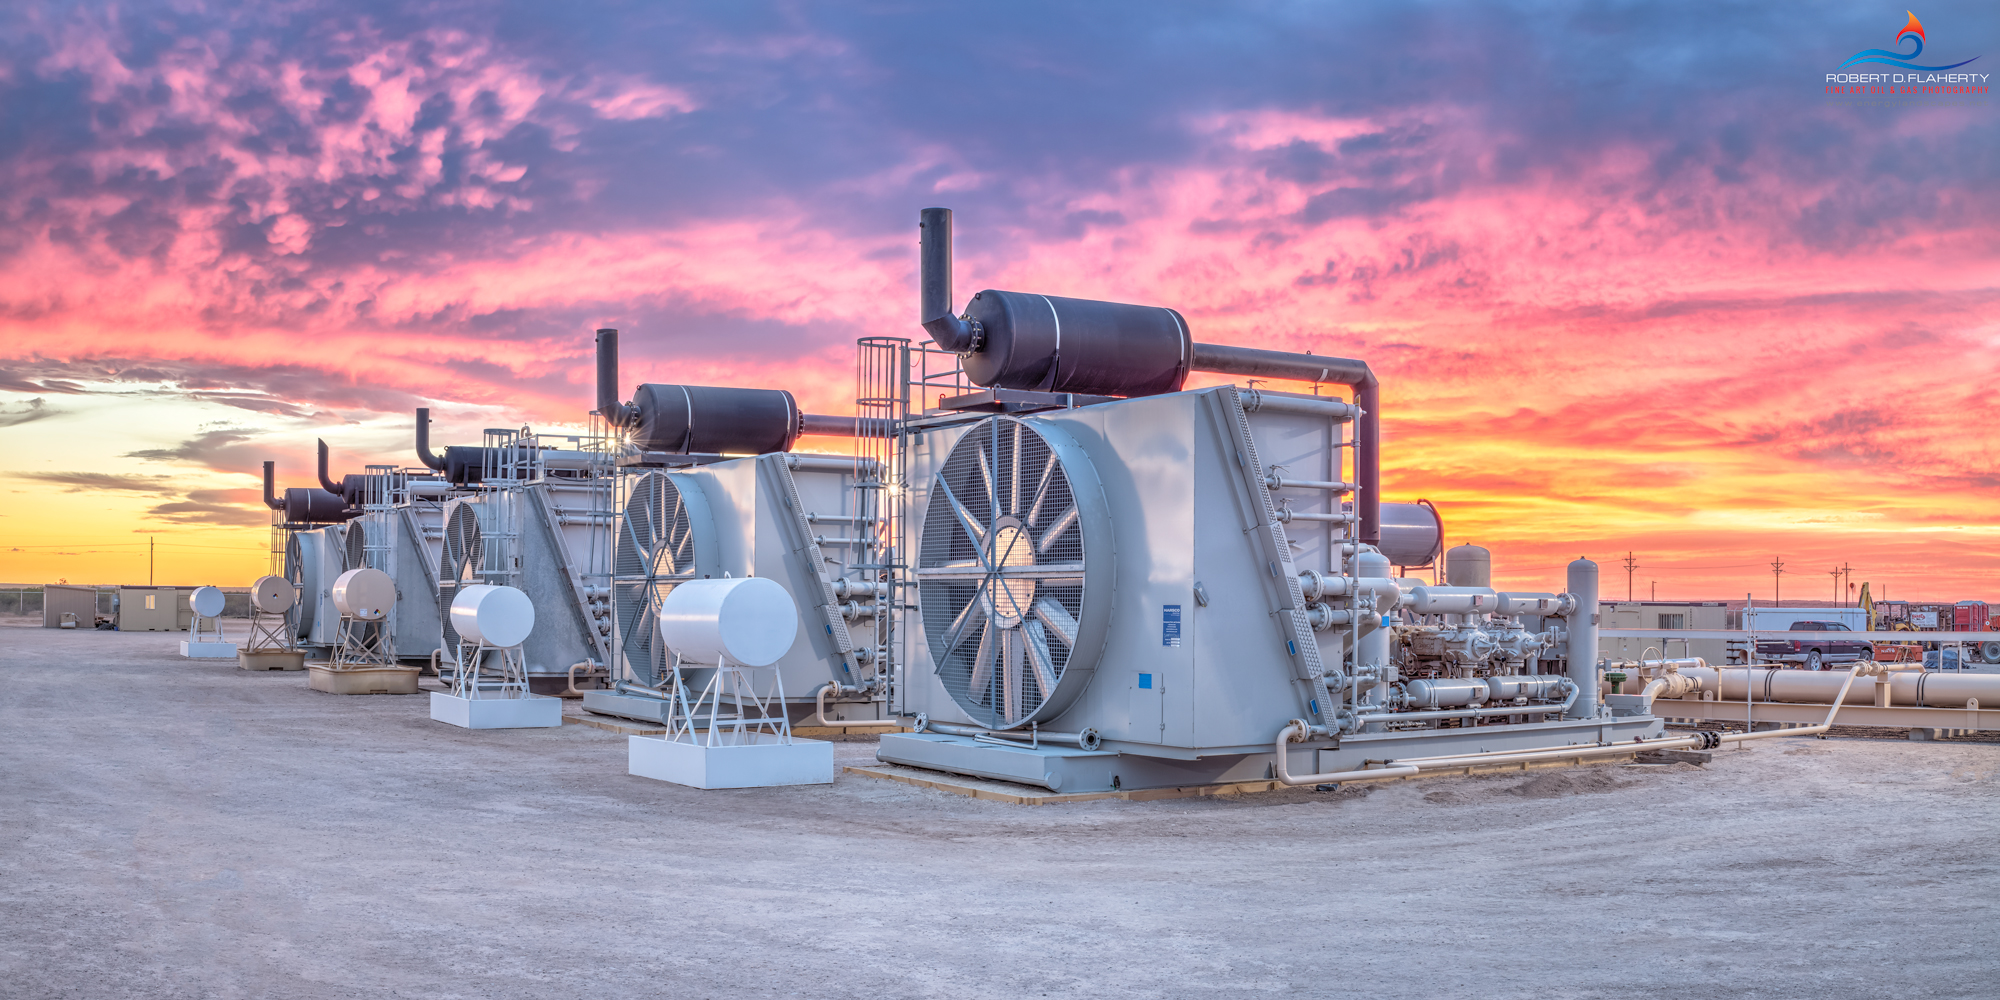 Delaware Basin, sunset, Permian Basin, compressor, compressor Battery, Summer, mural, fine art mural, Texas, West Texas, high resolution , photo